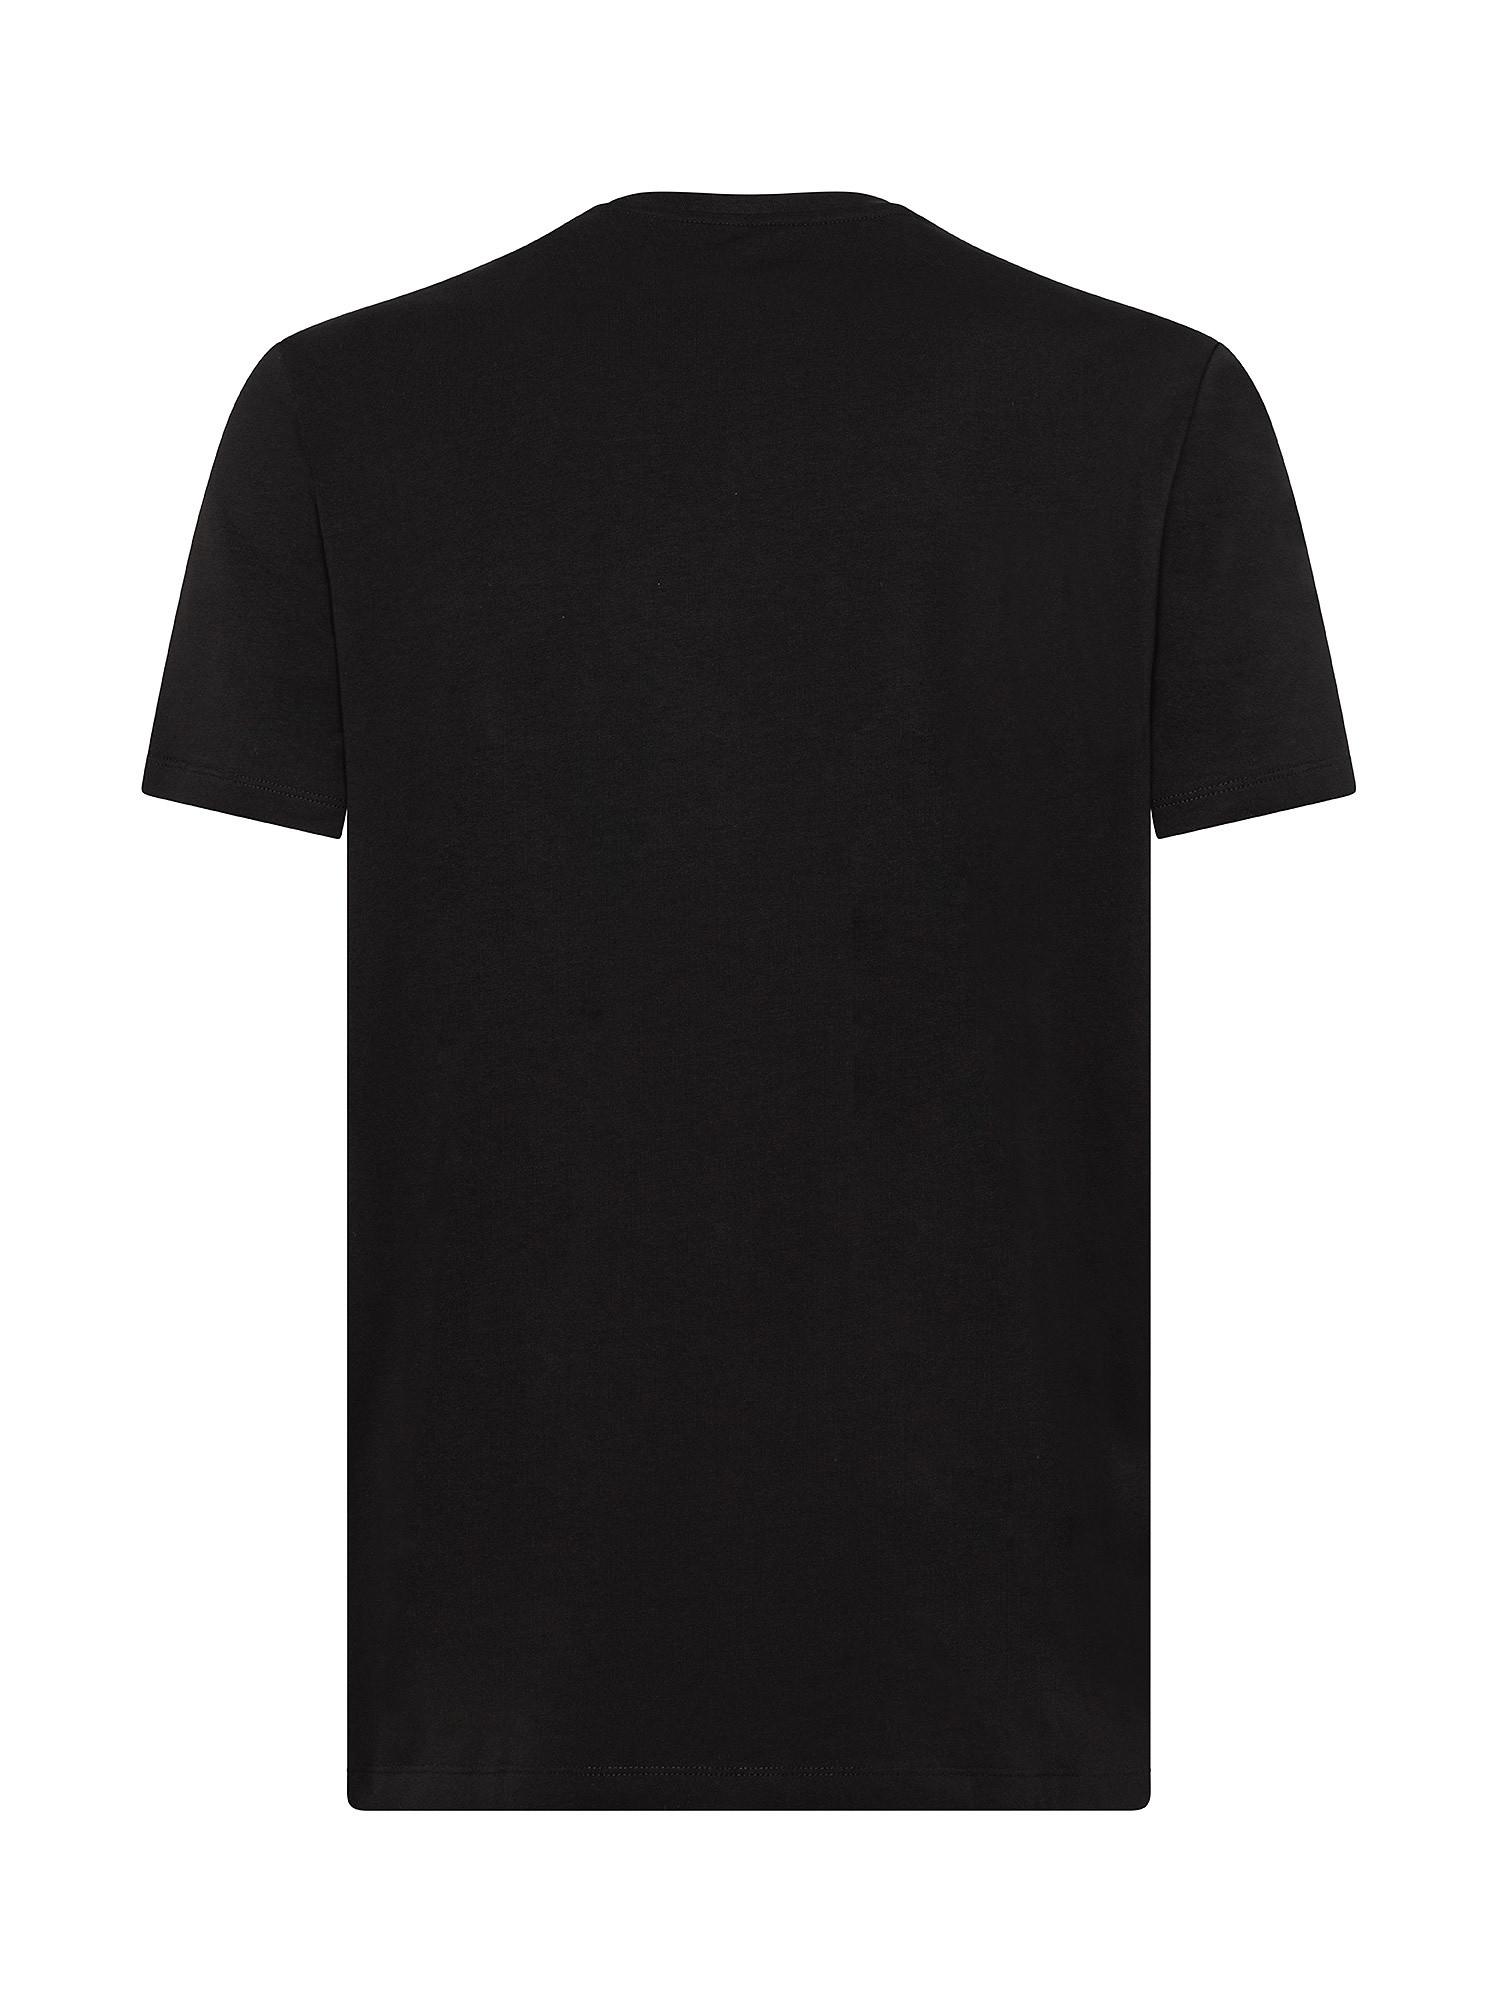 T-Shirt stretch, Nero, large image number 1